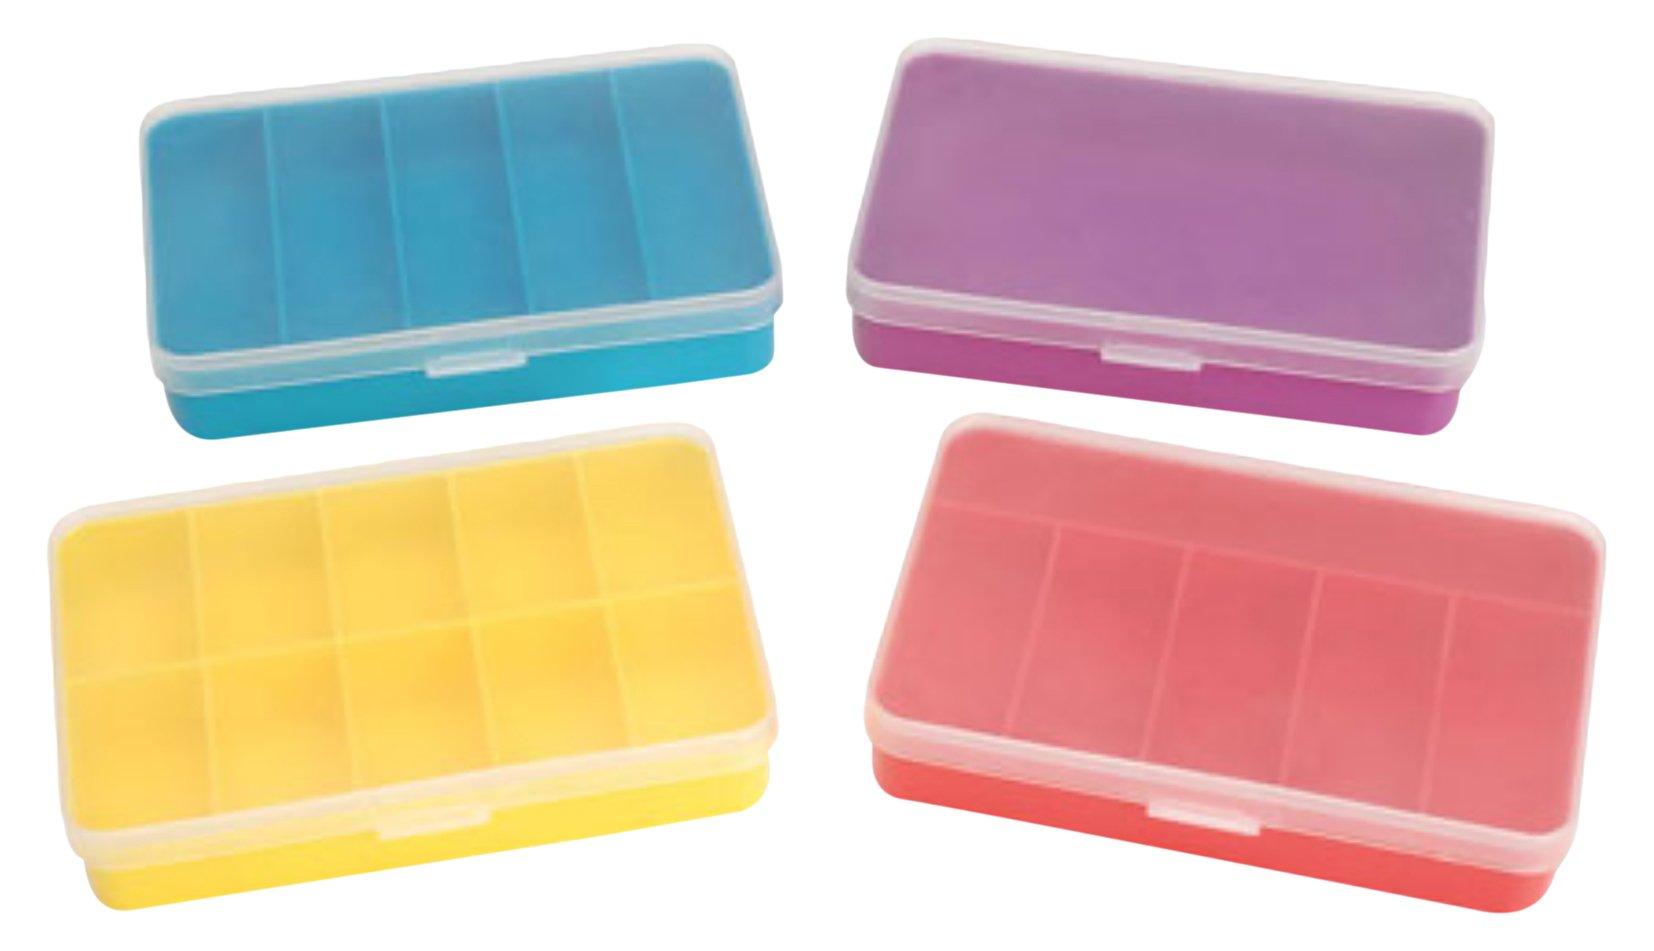 Darice DAR032ST24 Mini Storage Box, 4 Assorted Styles (Pack of 24)